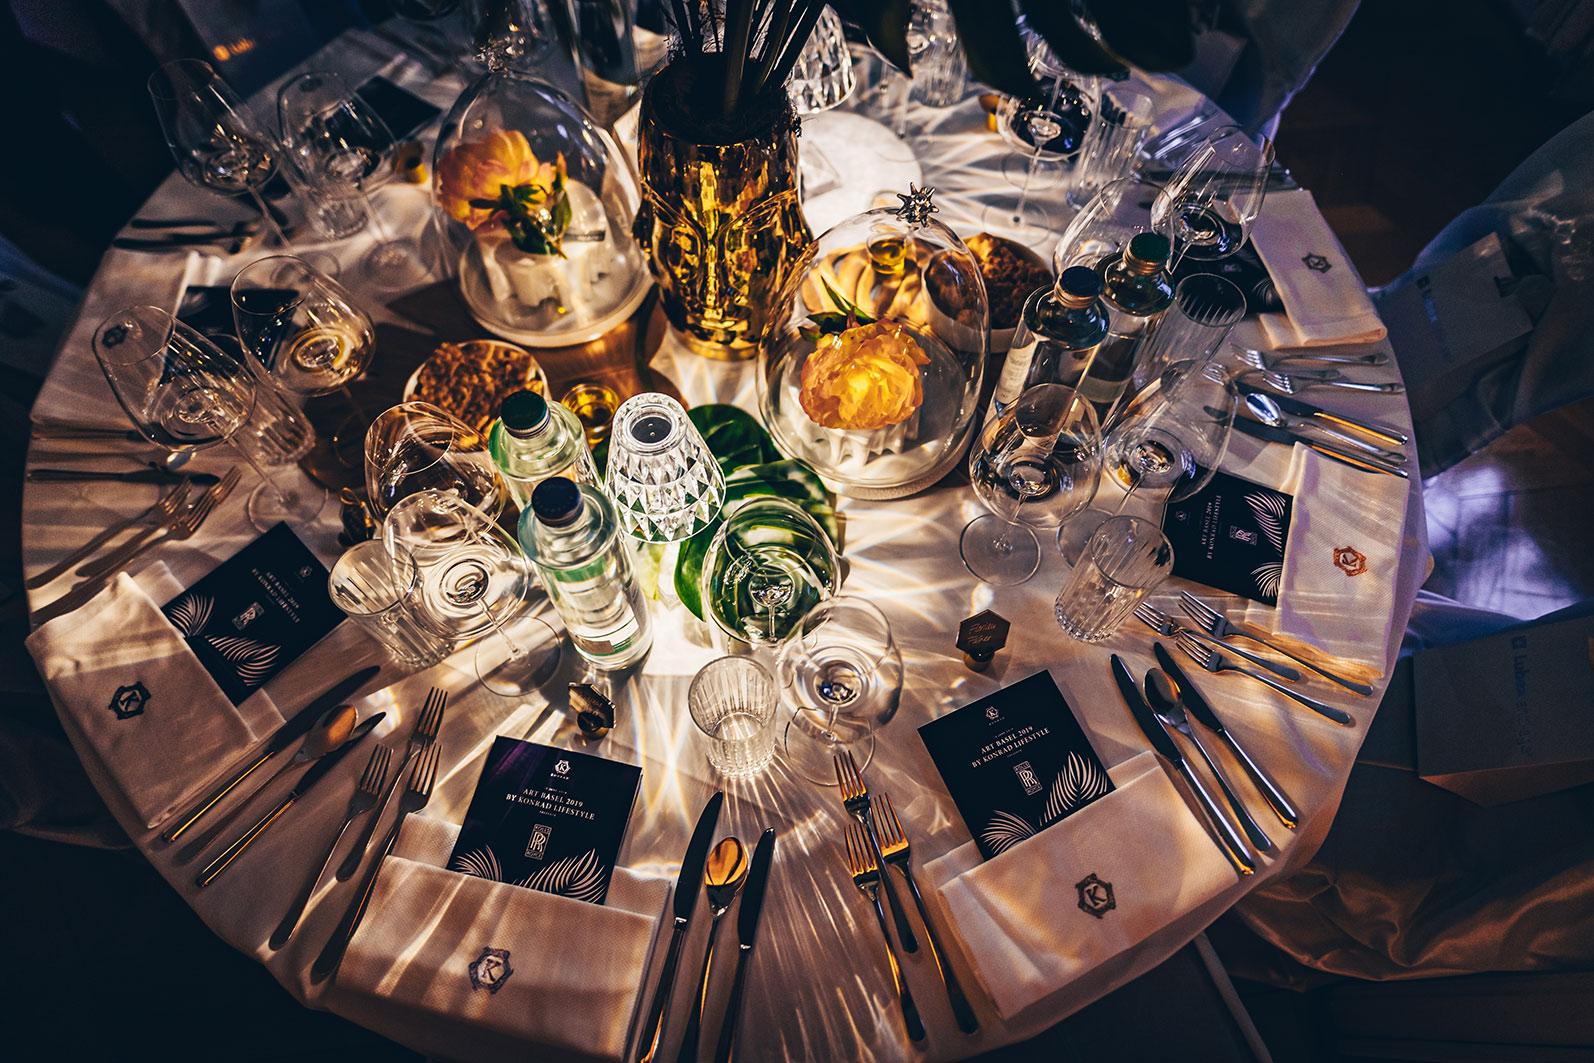 Konrad-lifestyle-art-basel-'rollsroyce'-2019-108.jpg